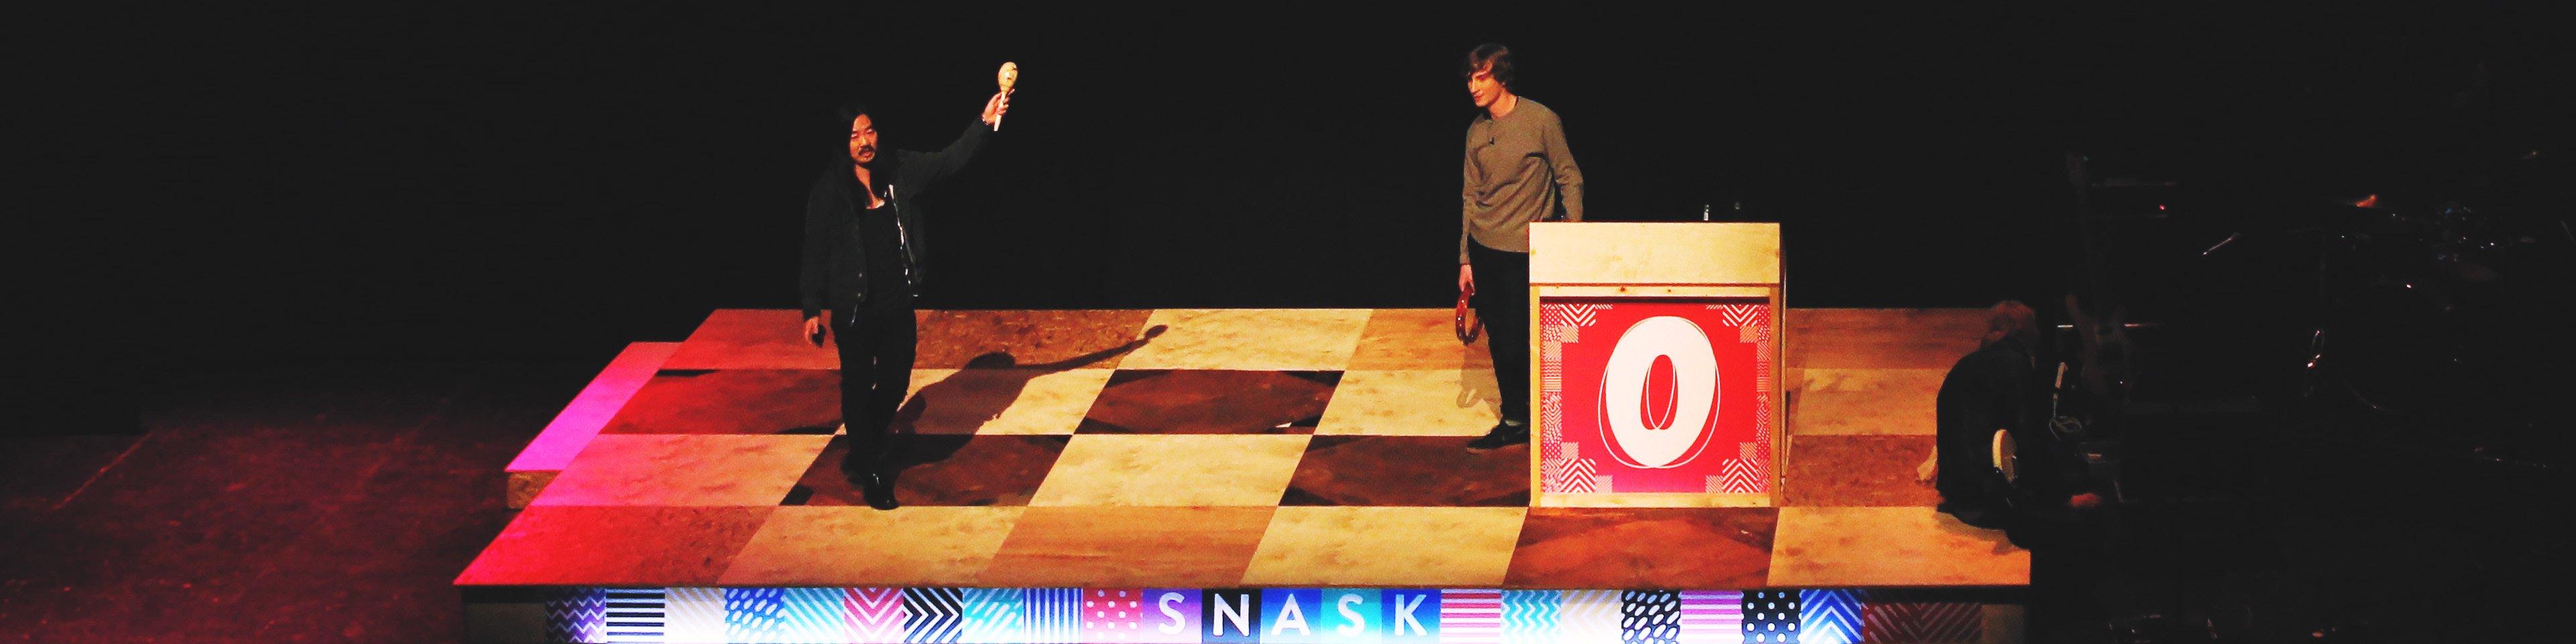 Snask at OFFSET 2015